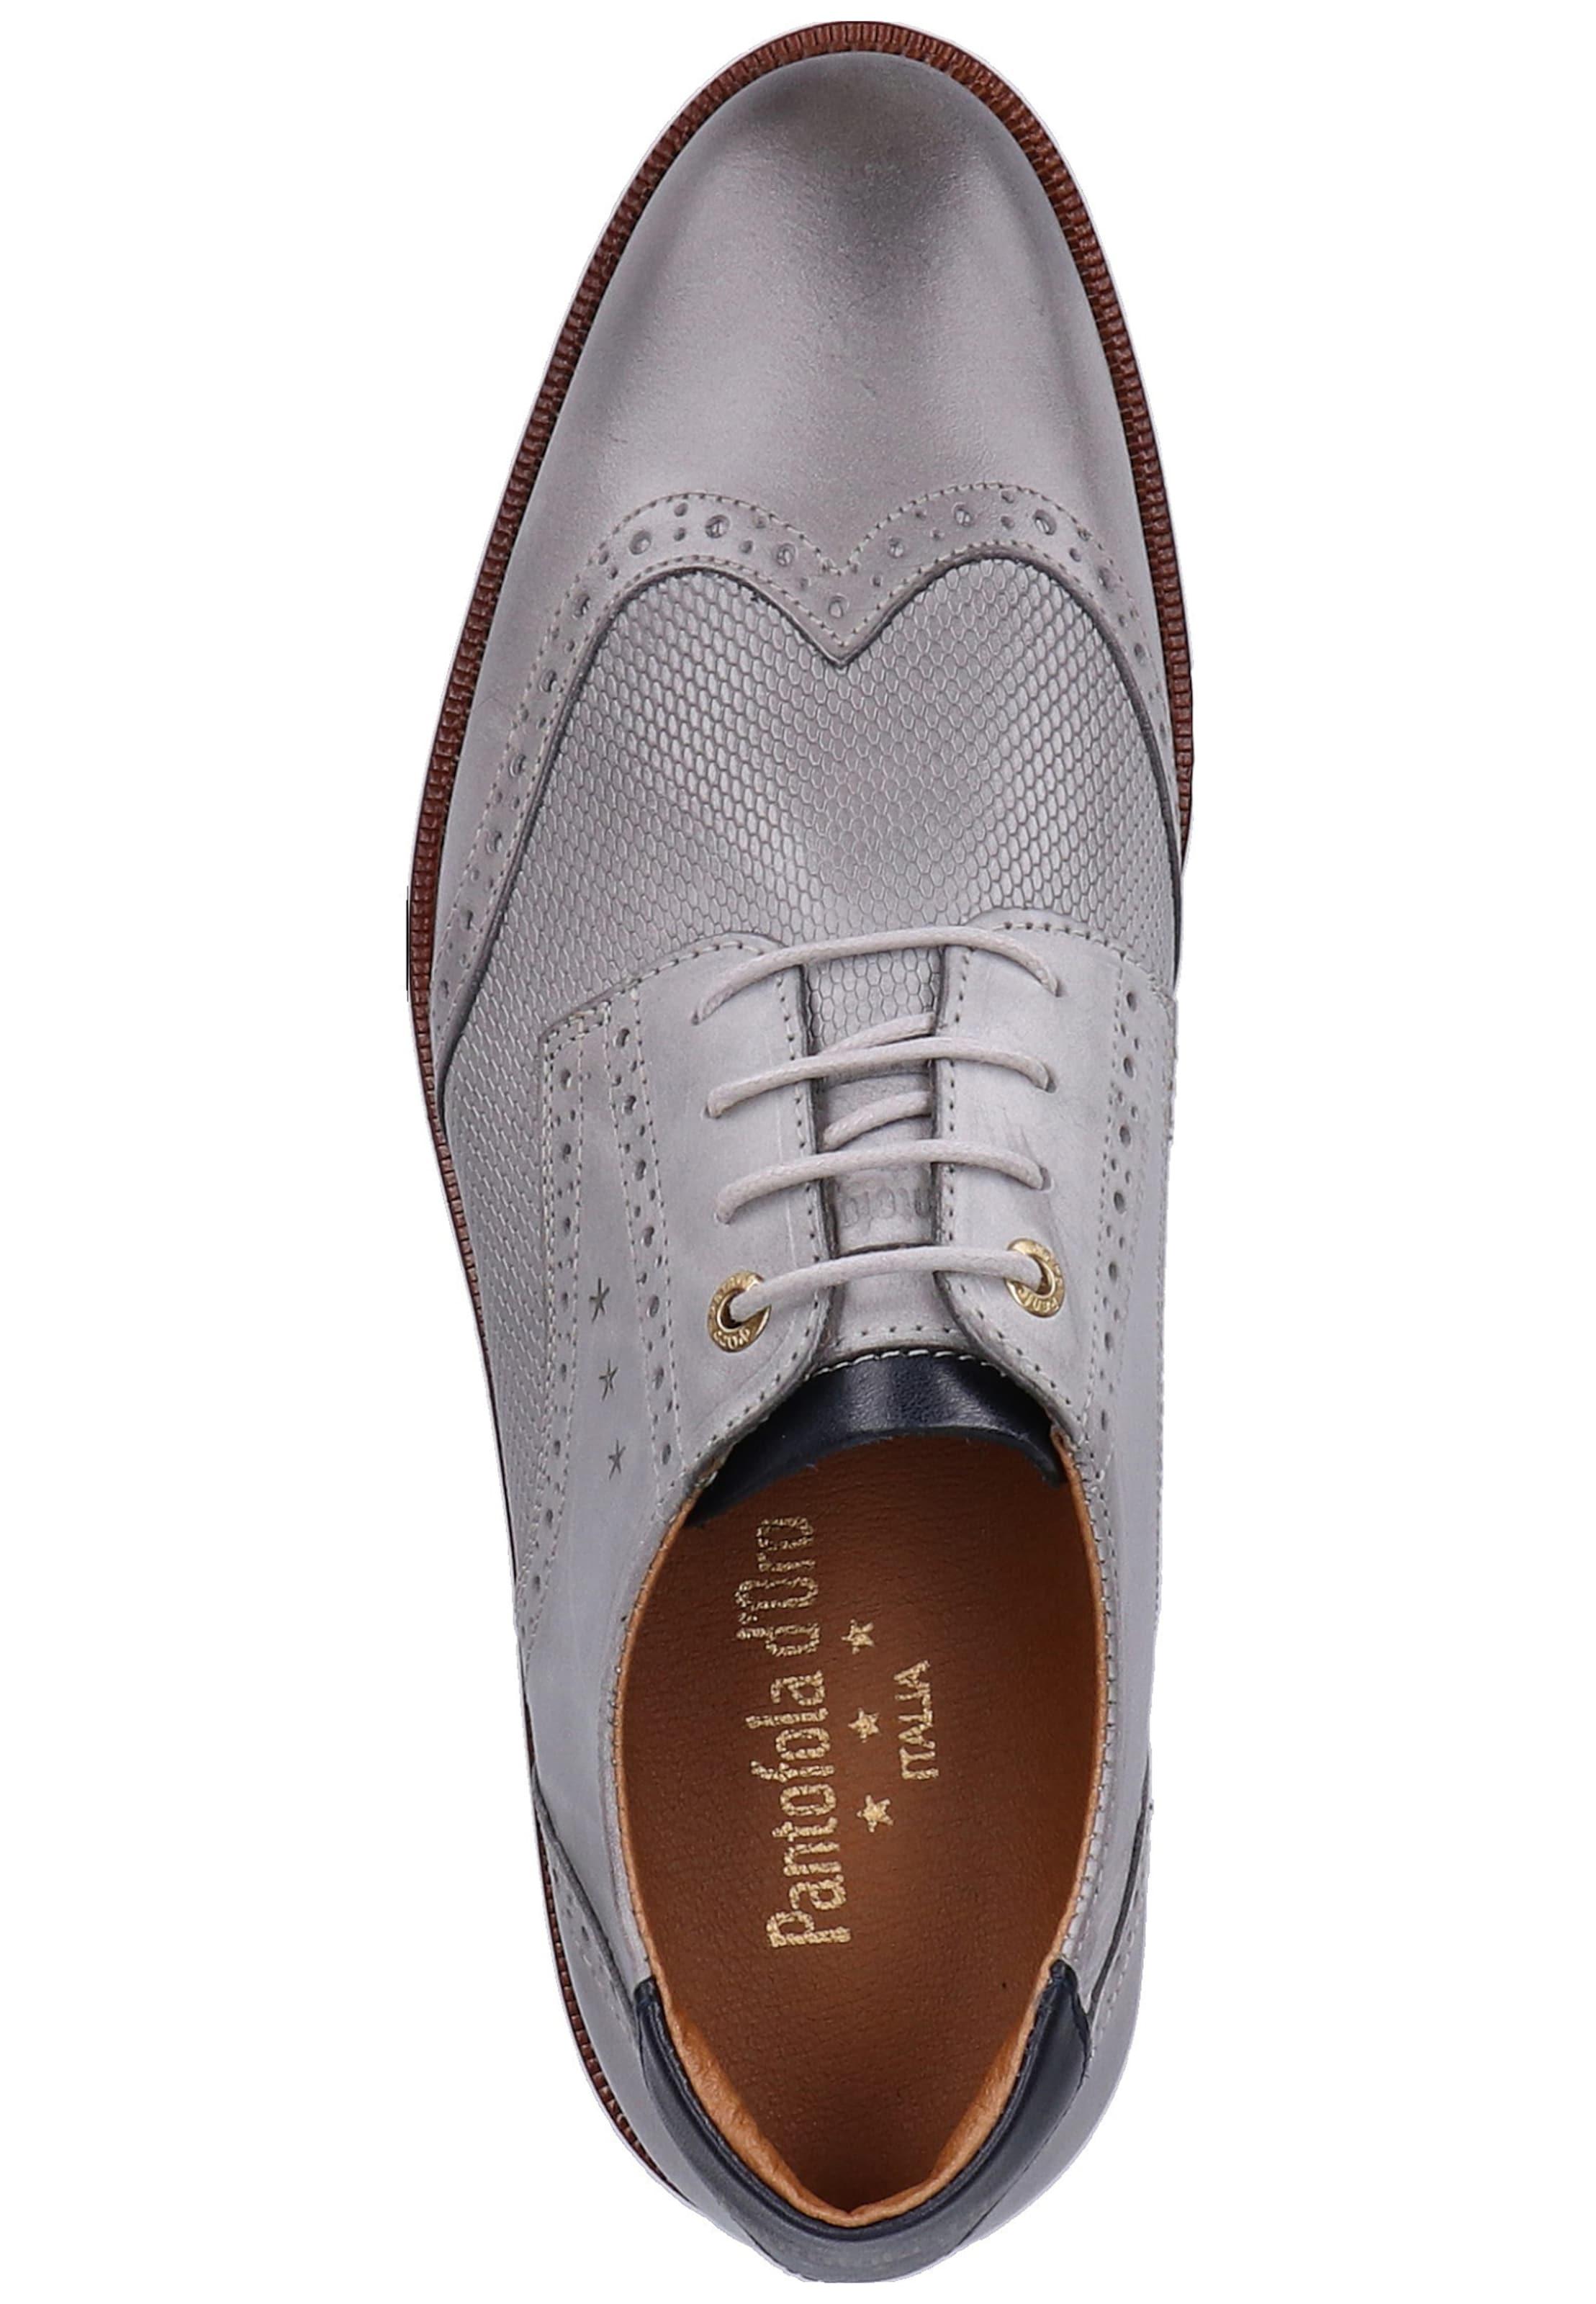 D'oro In Halbschuhe Halbschuhe Pantofola Grau Pantofola Pantofola Grau In D'oro QeBWdxErCo